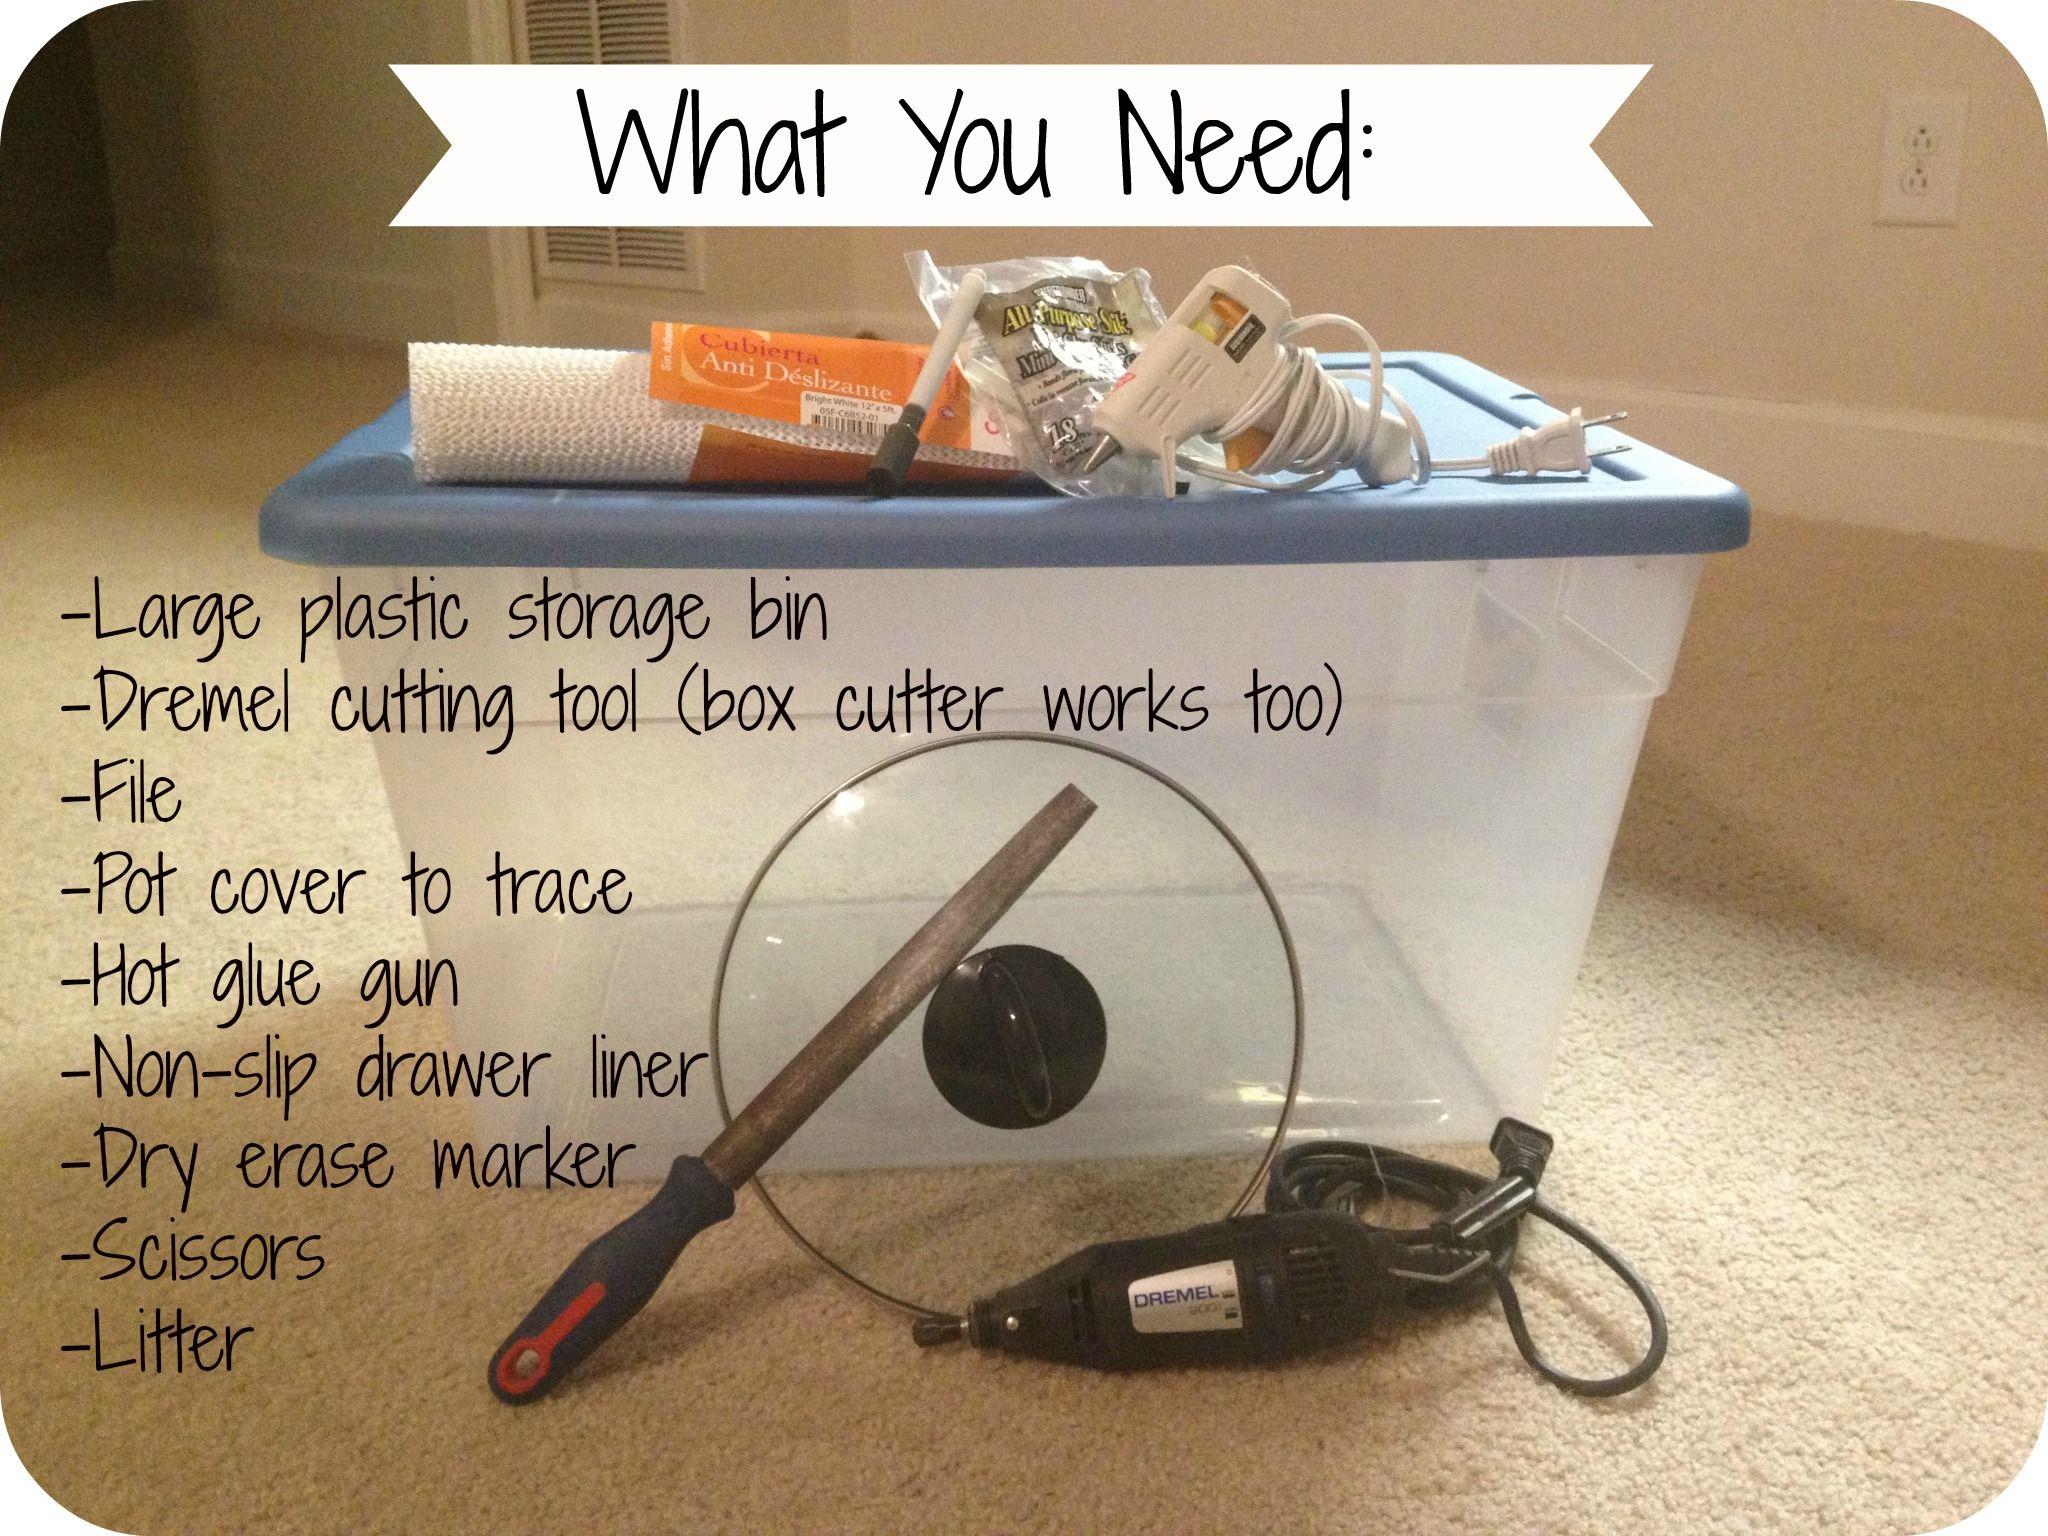 diy top entry litter box - Litter Boxes